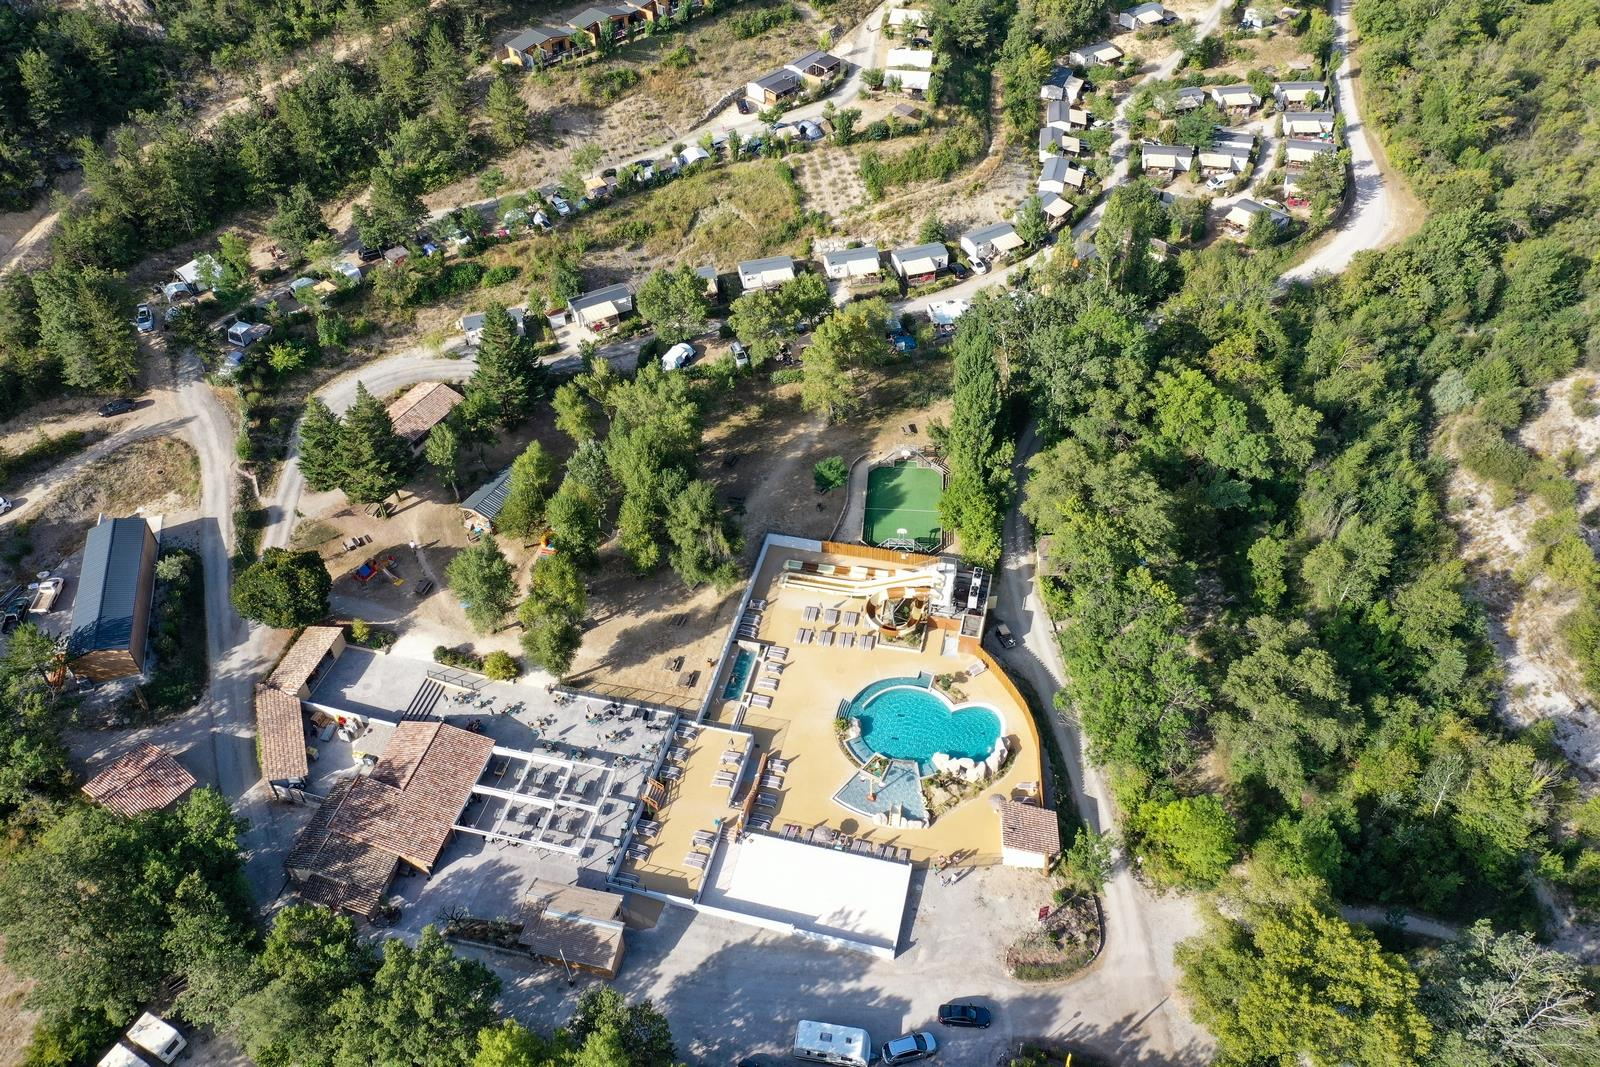 Yelloh! Village Camping les Ramieres, Sahune, Drôme